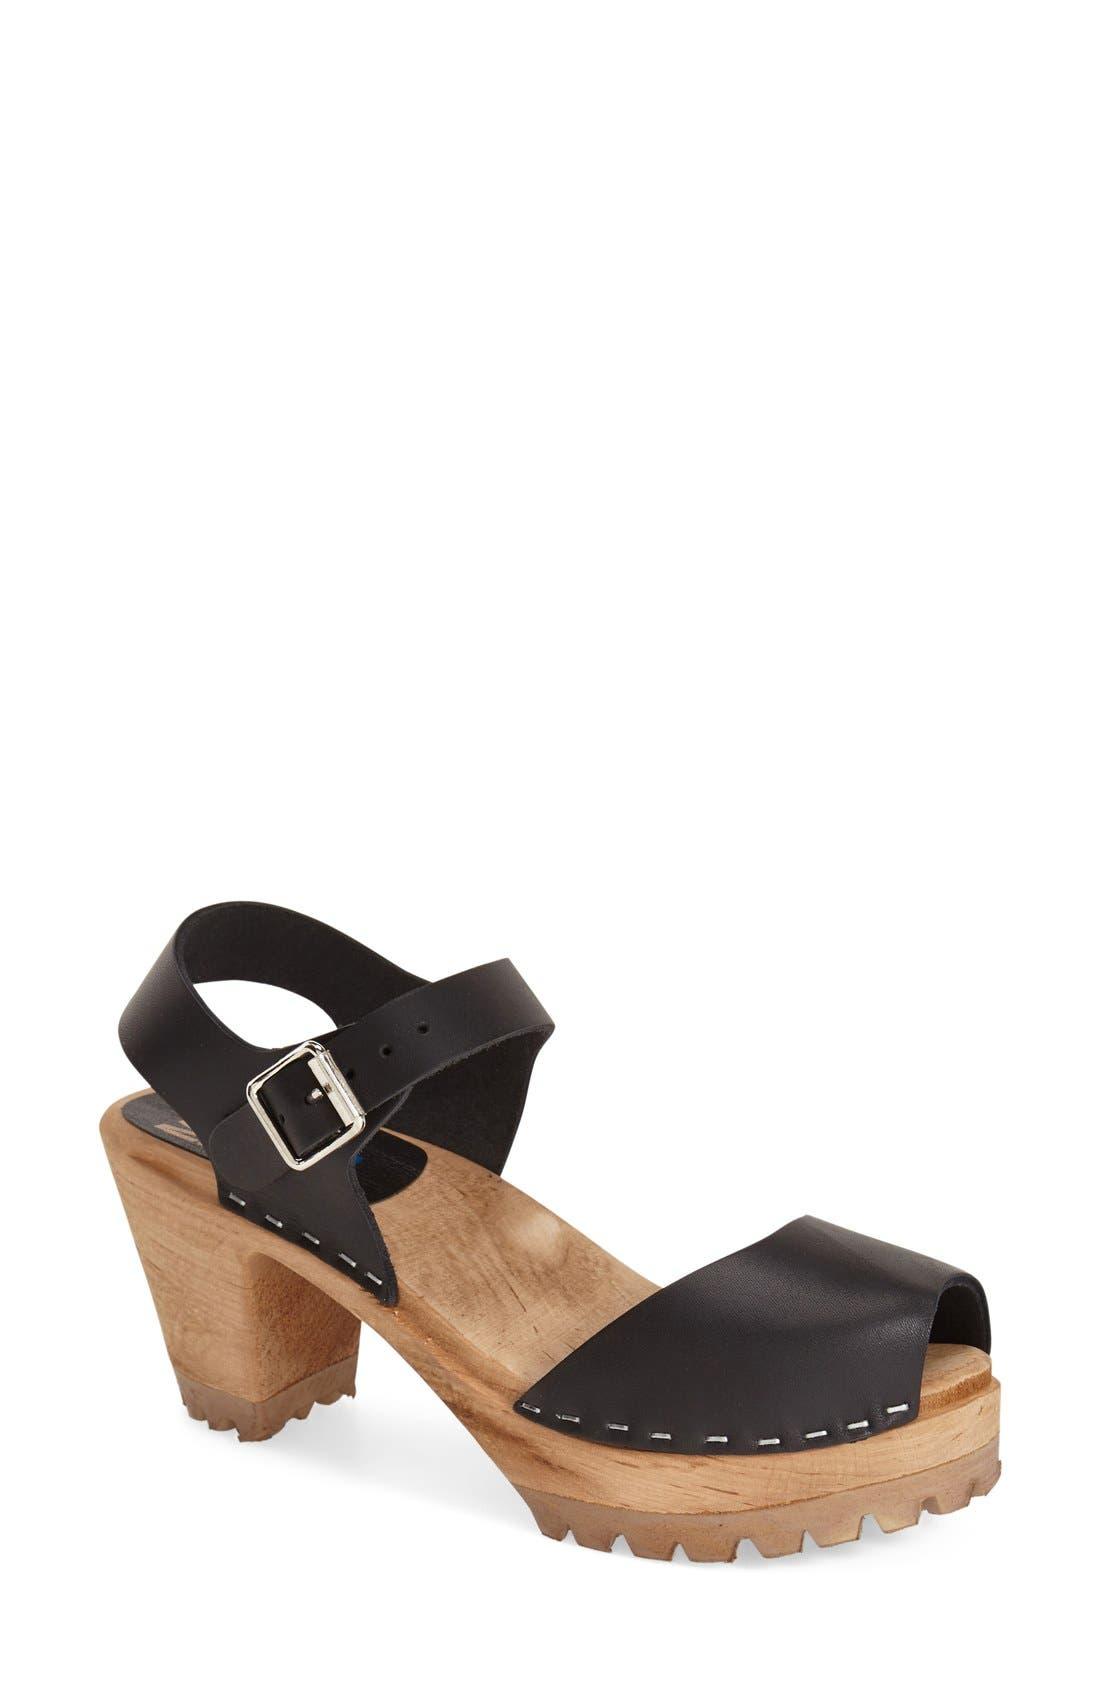 'Greta' Clog Sandal